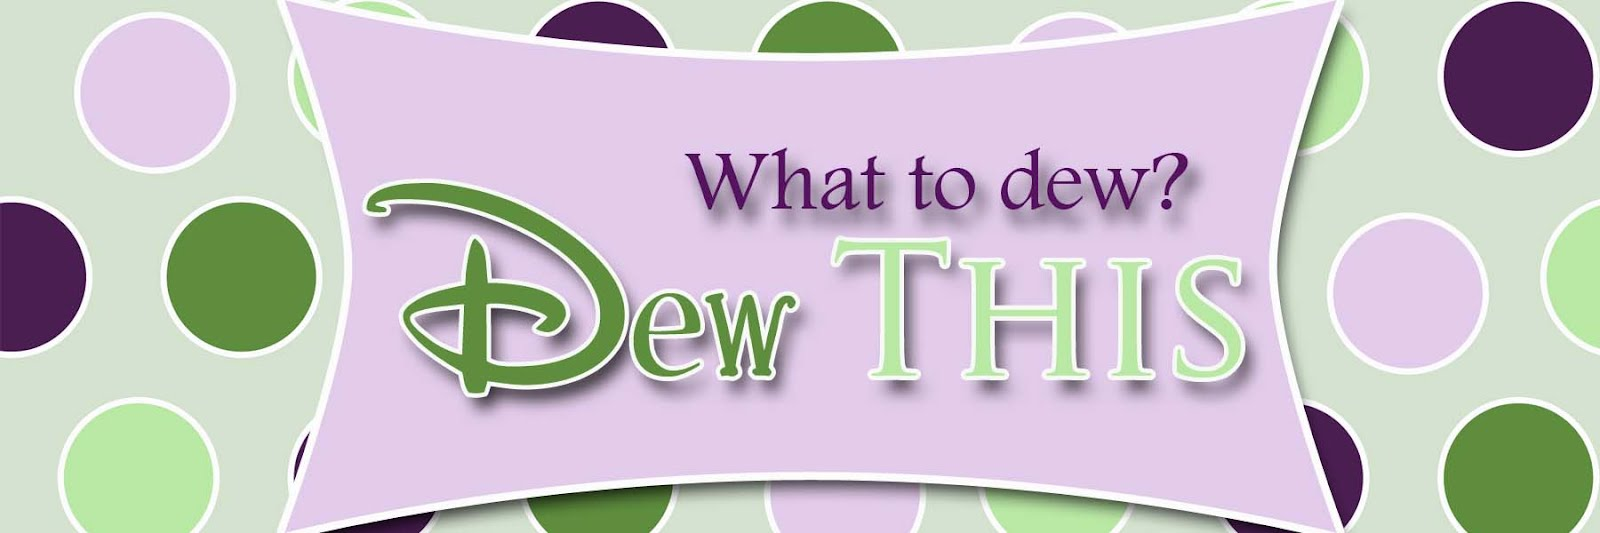 Dew THIS